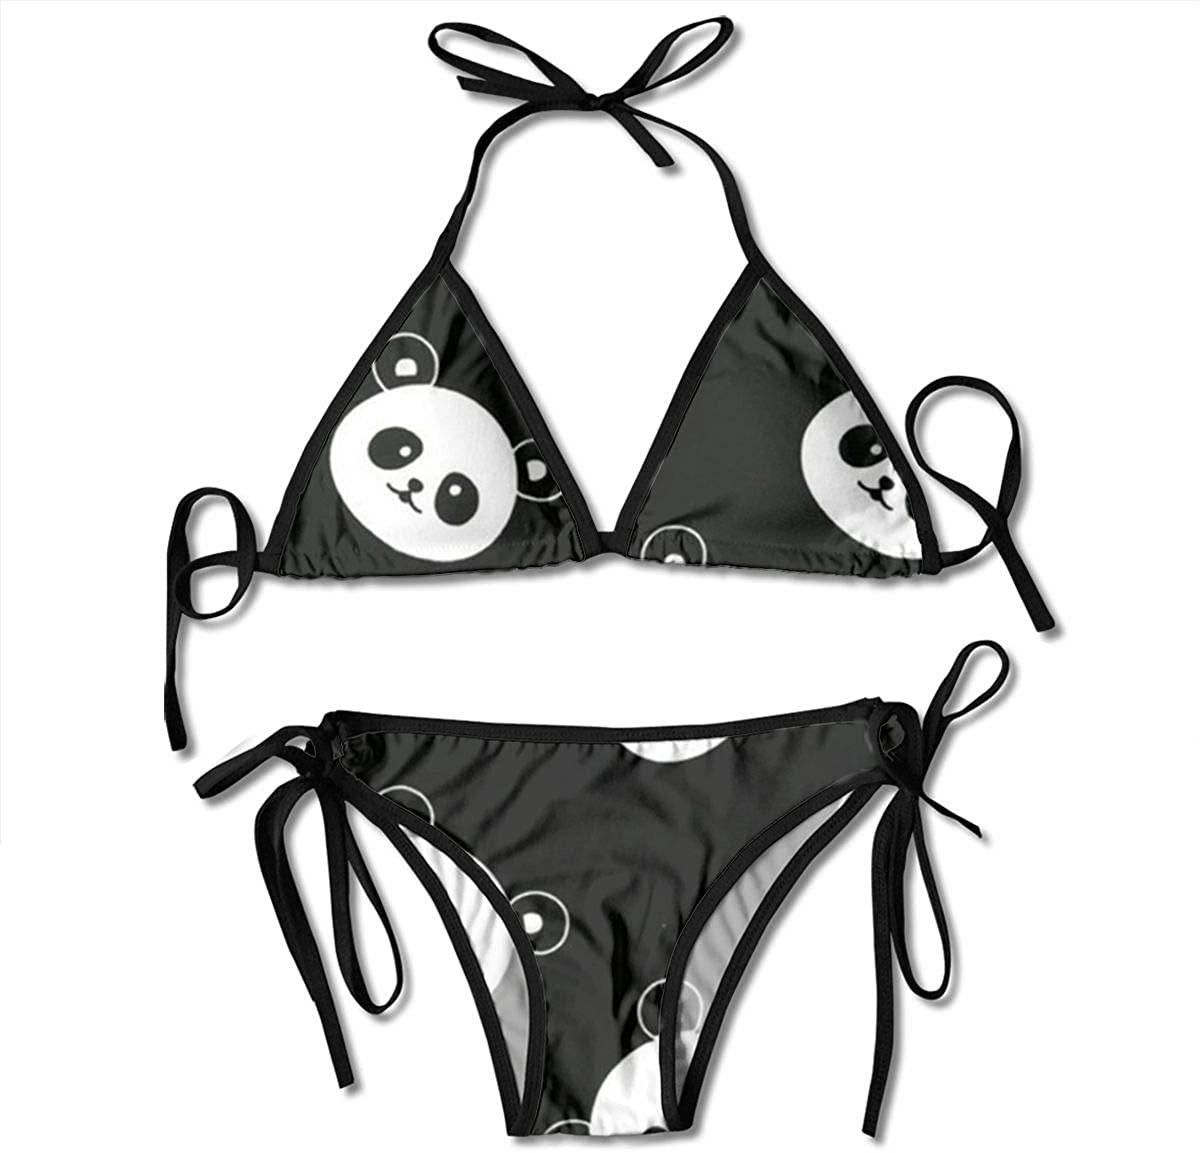 Ruin Panda Women's Two Piece Triangle Bikini Set Swimwear Swimsuits Beachwear